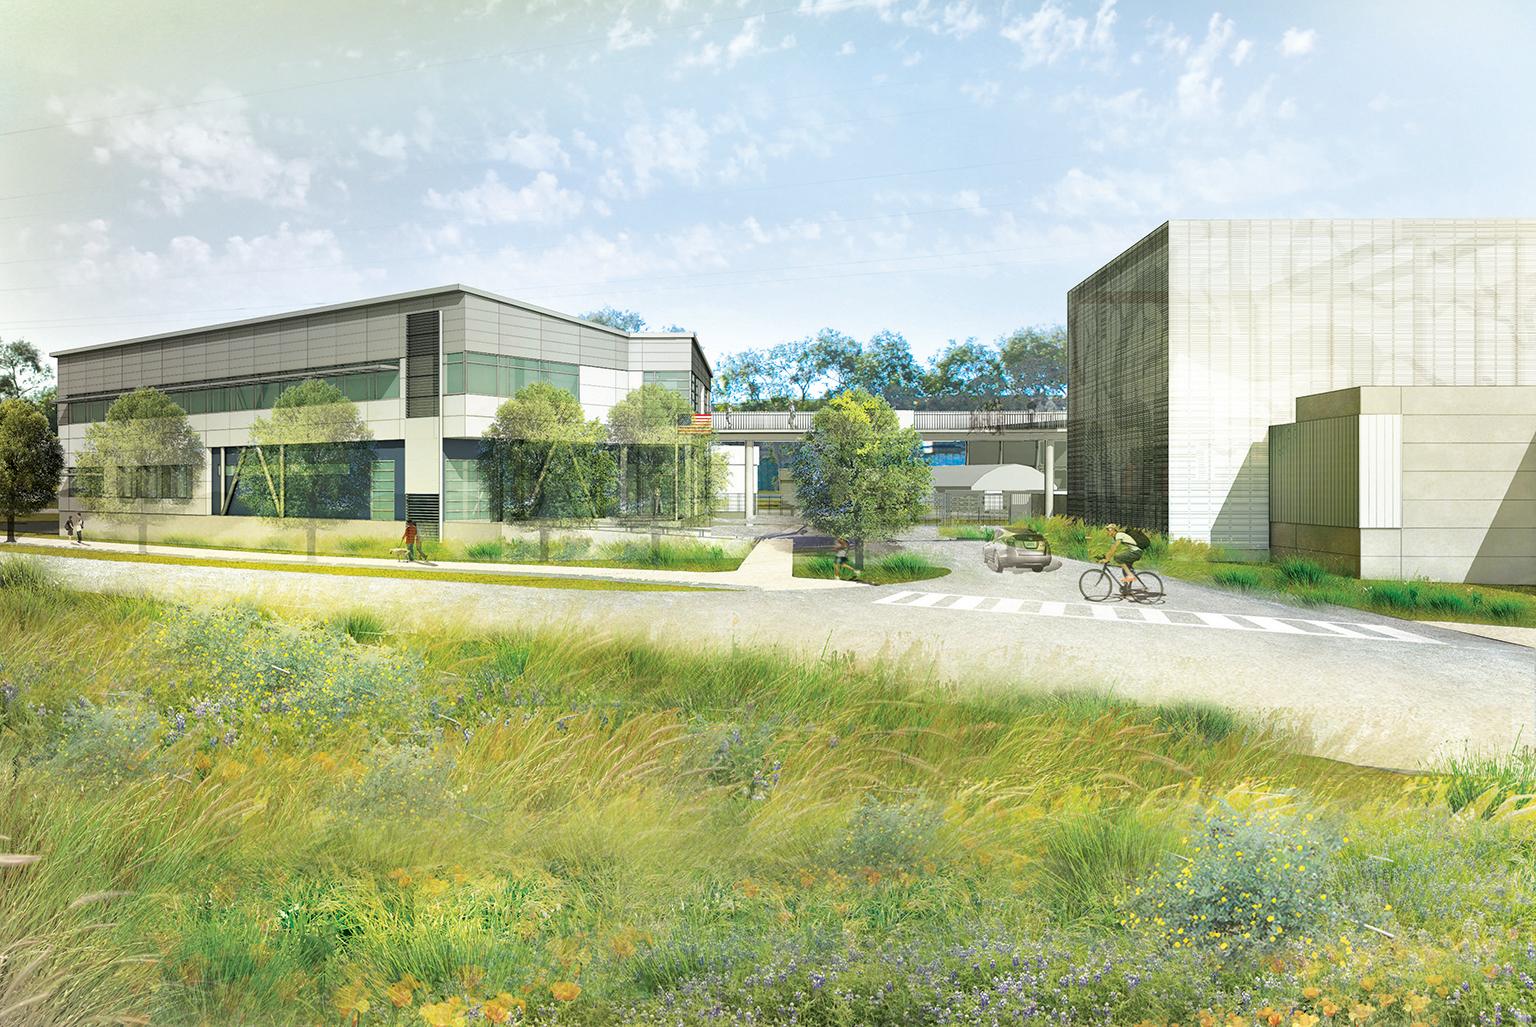 San Mateo Wastewater Treatment Plant